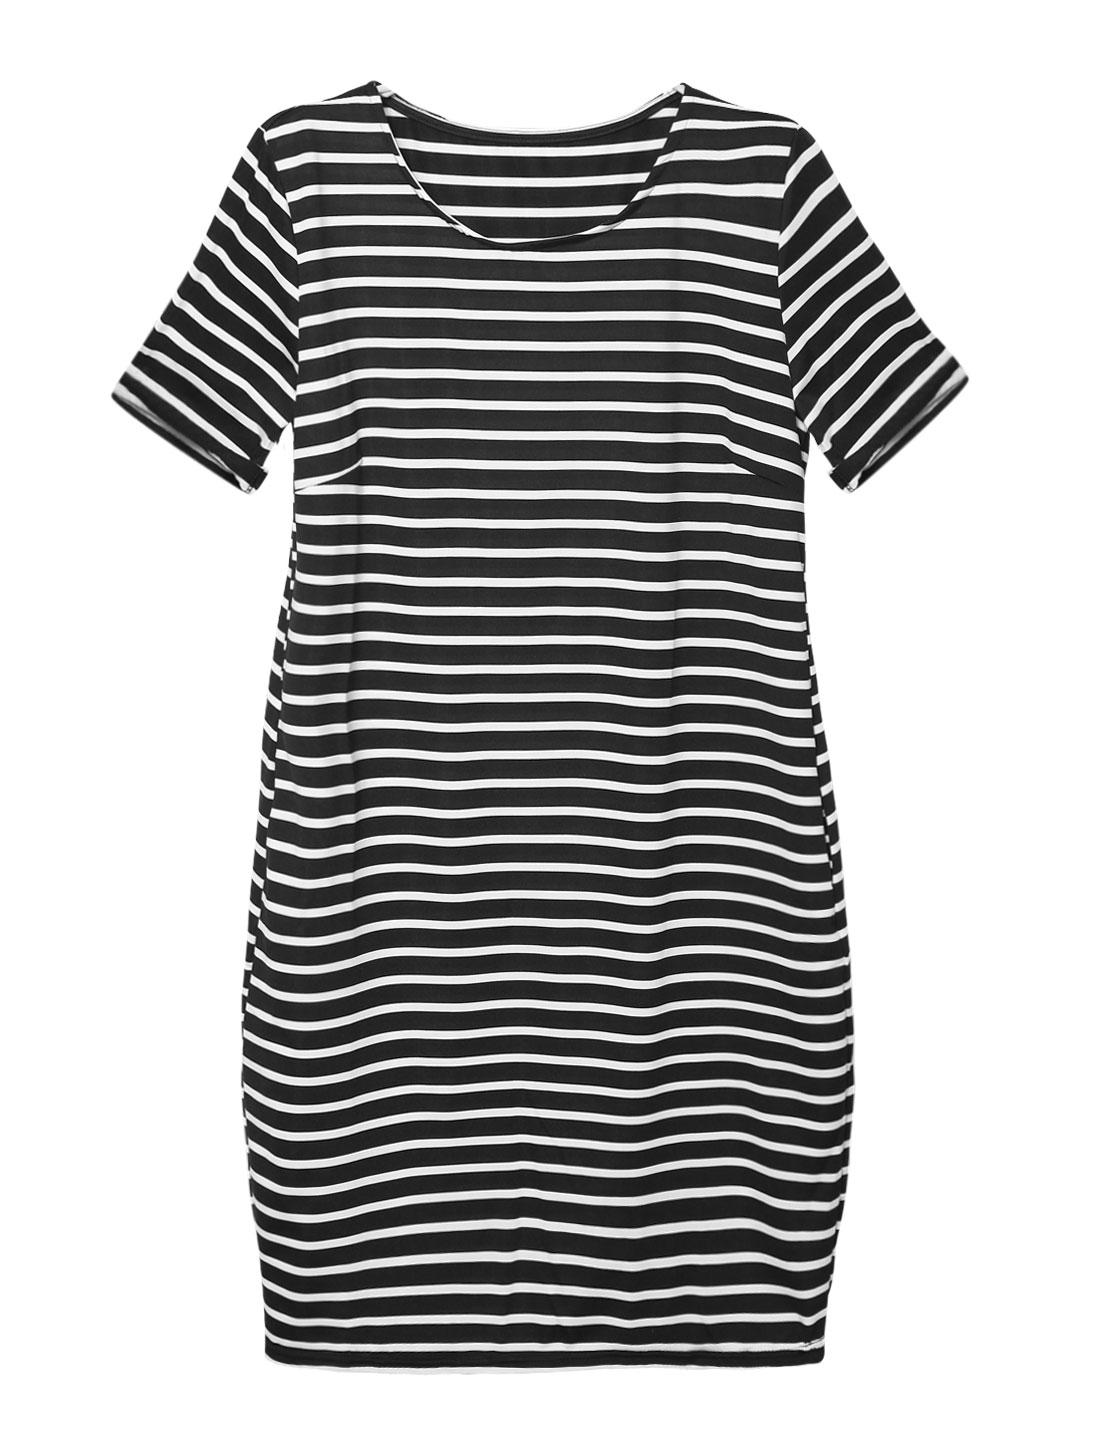 Women Cuffed Sleeves Slant Pockets Stripes Tunic Dress Black M